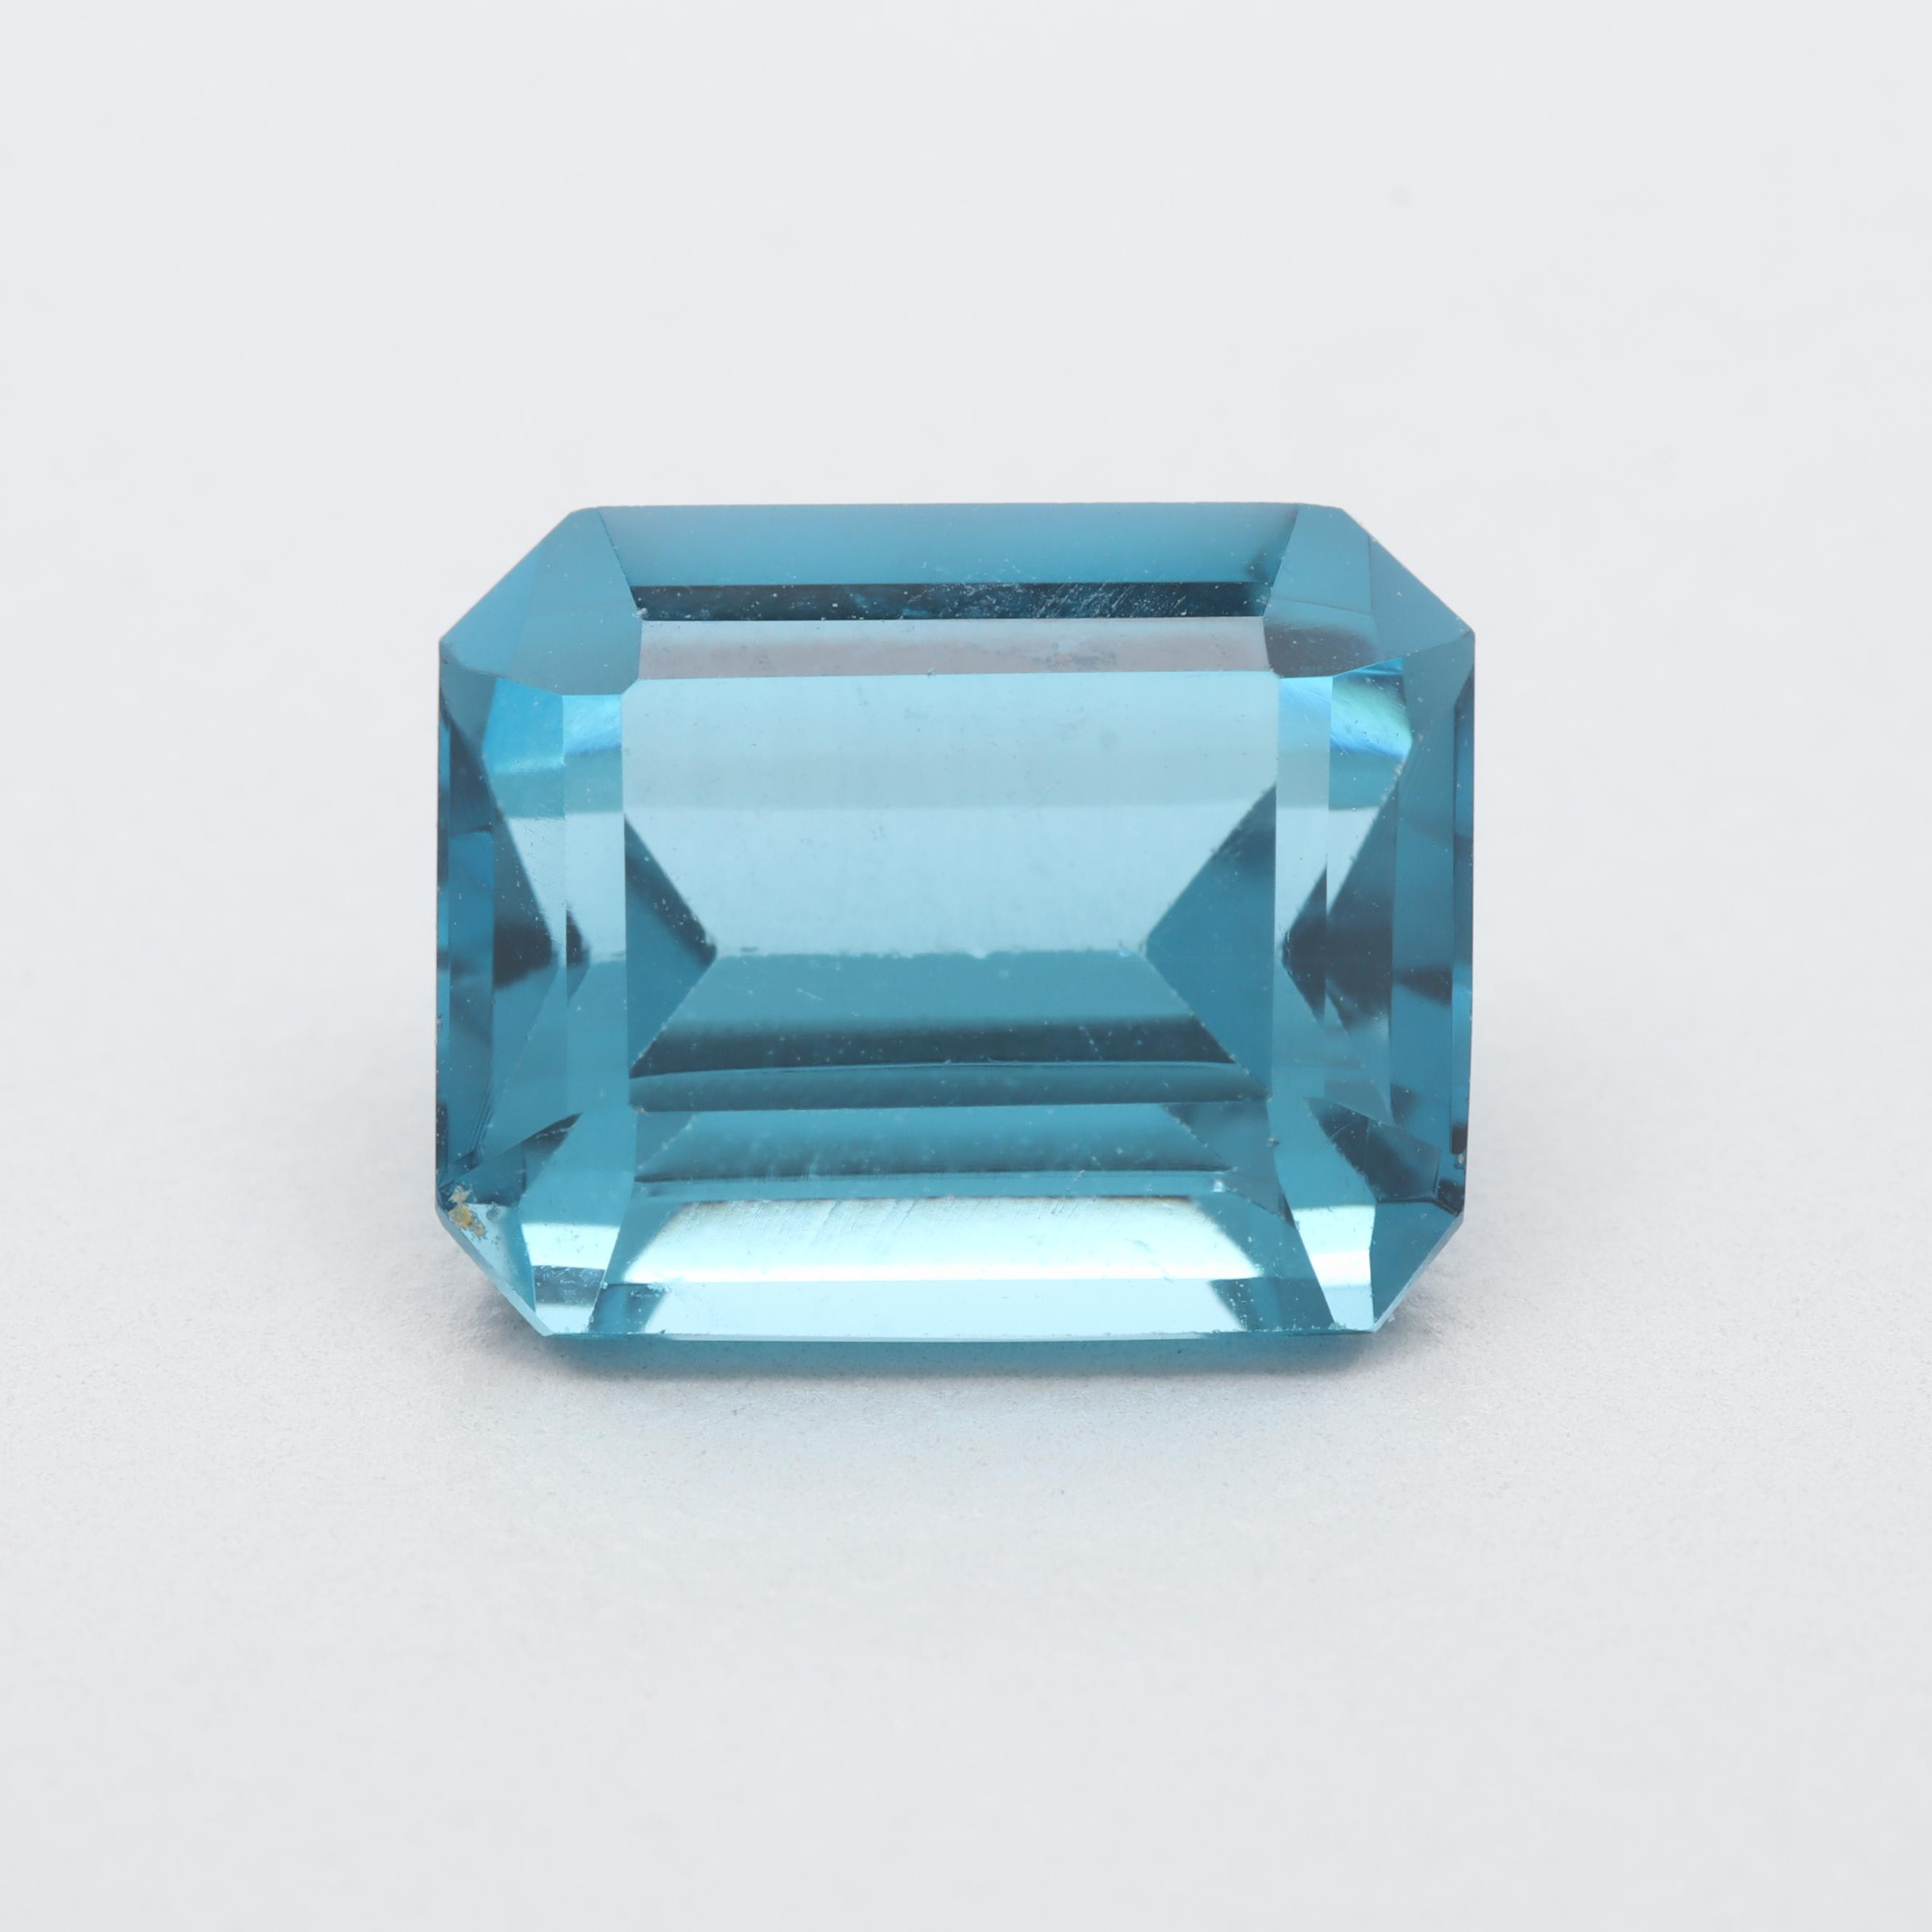 Loose 3.92 CT Blue Topaz Gemstone